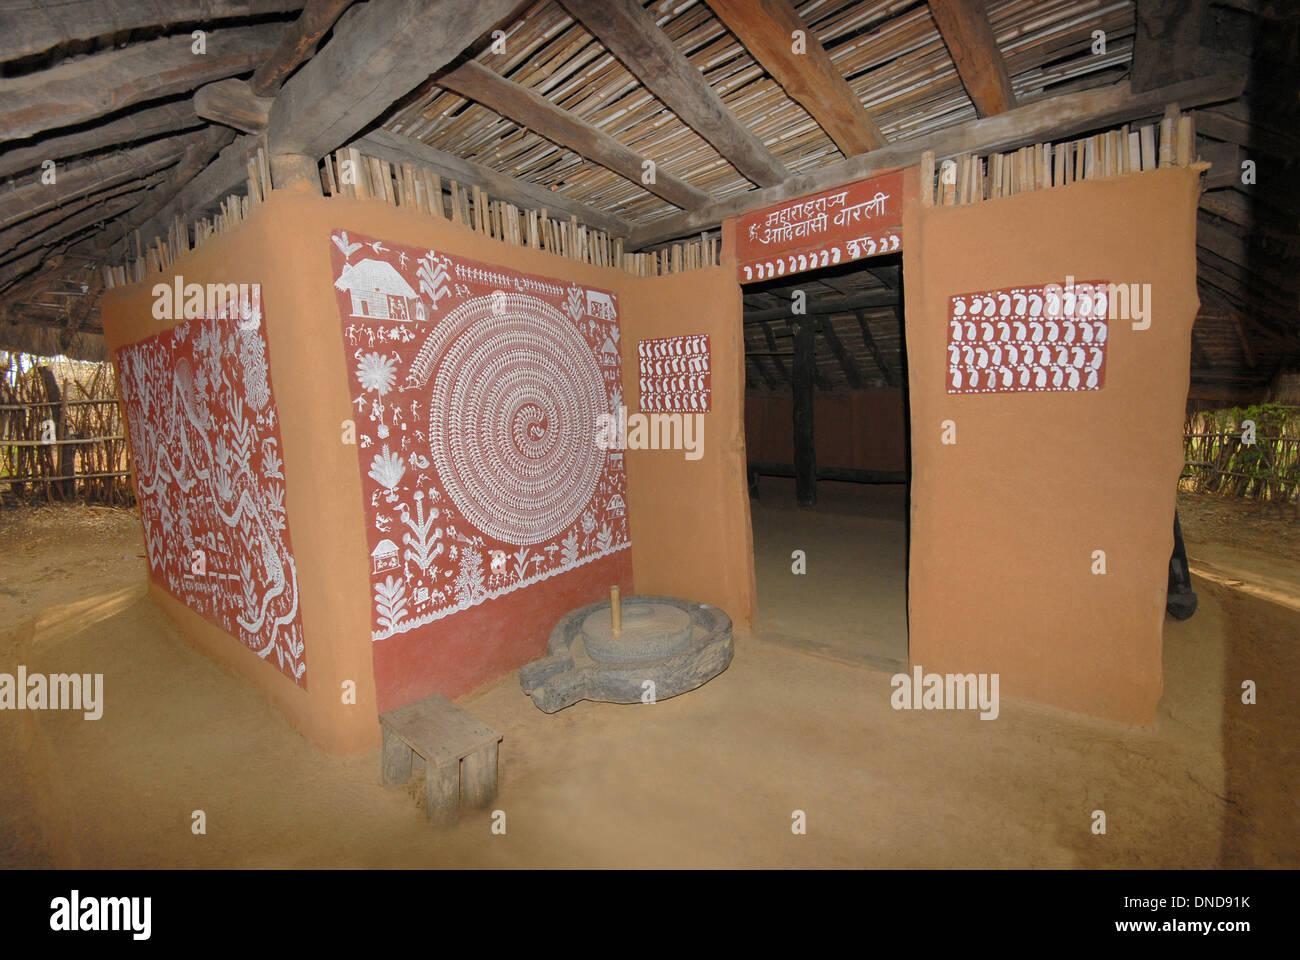 Tribal hut warli tribe maharashtra manav sangrahalaya bhopal warli tribe maharashtra manav sangrahalaya bhopal madhya pradesh india altavistaventures Image collections